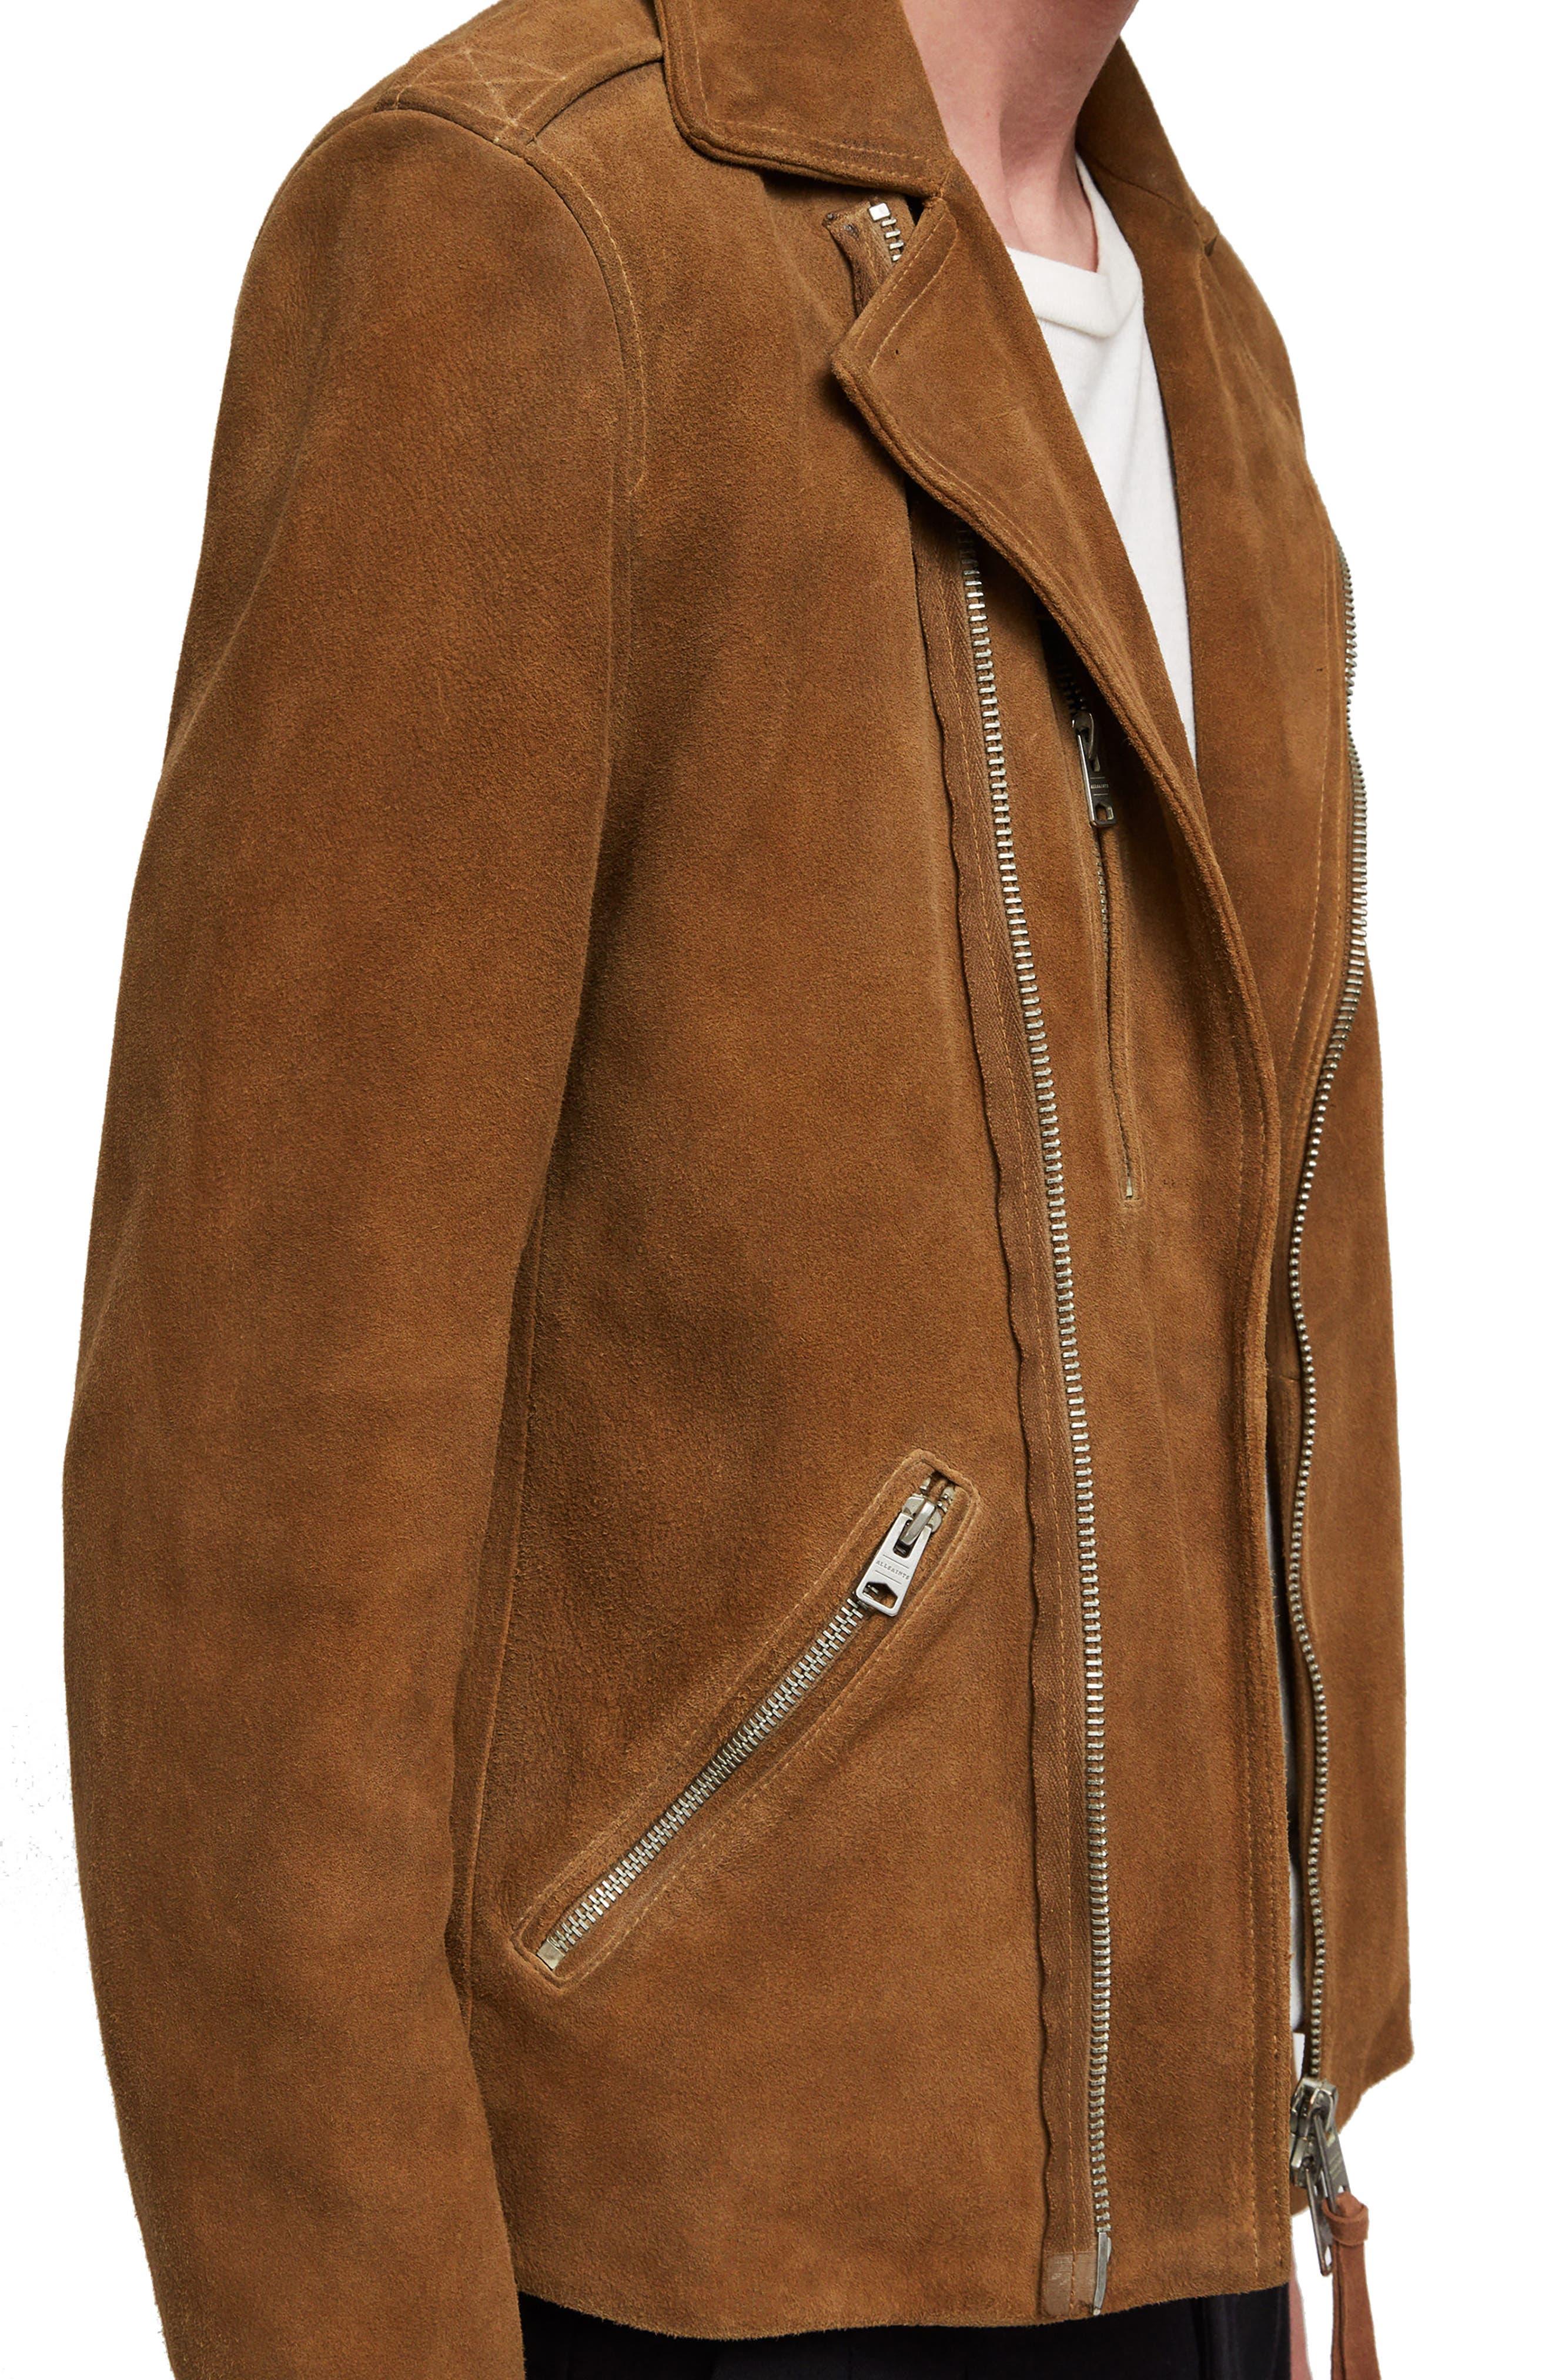 Judd Slim Fit Leather Biker Jacket,                             Alternate thumbnail 4, color,                             219